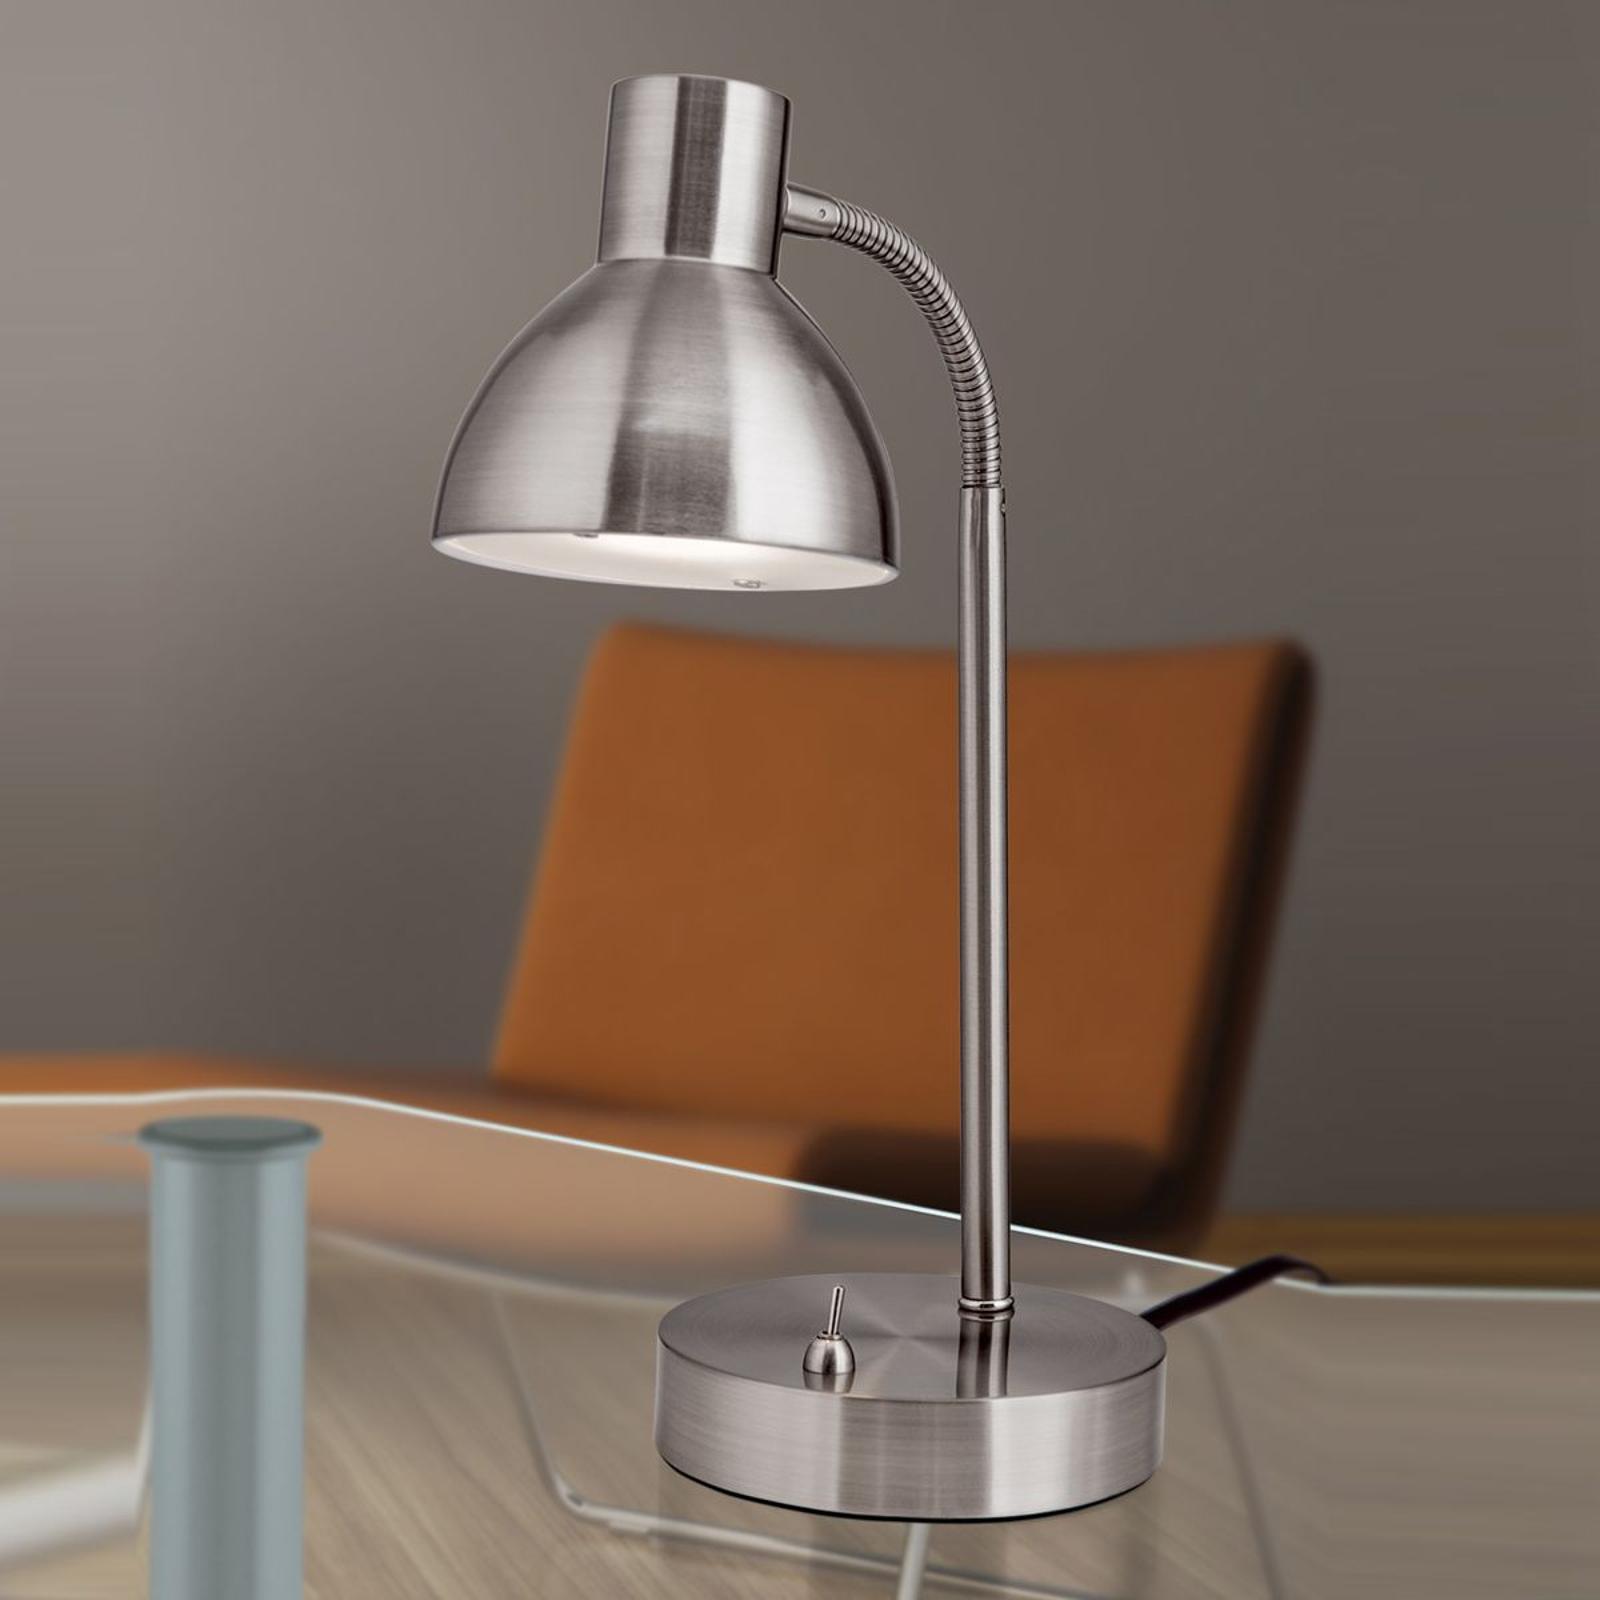 Lampada da scrivania LED Isra color nichel opaco